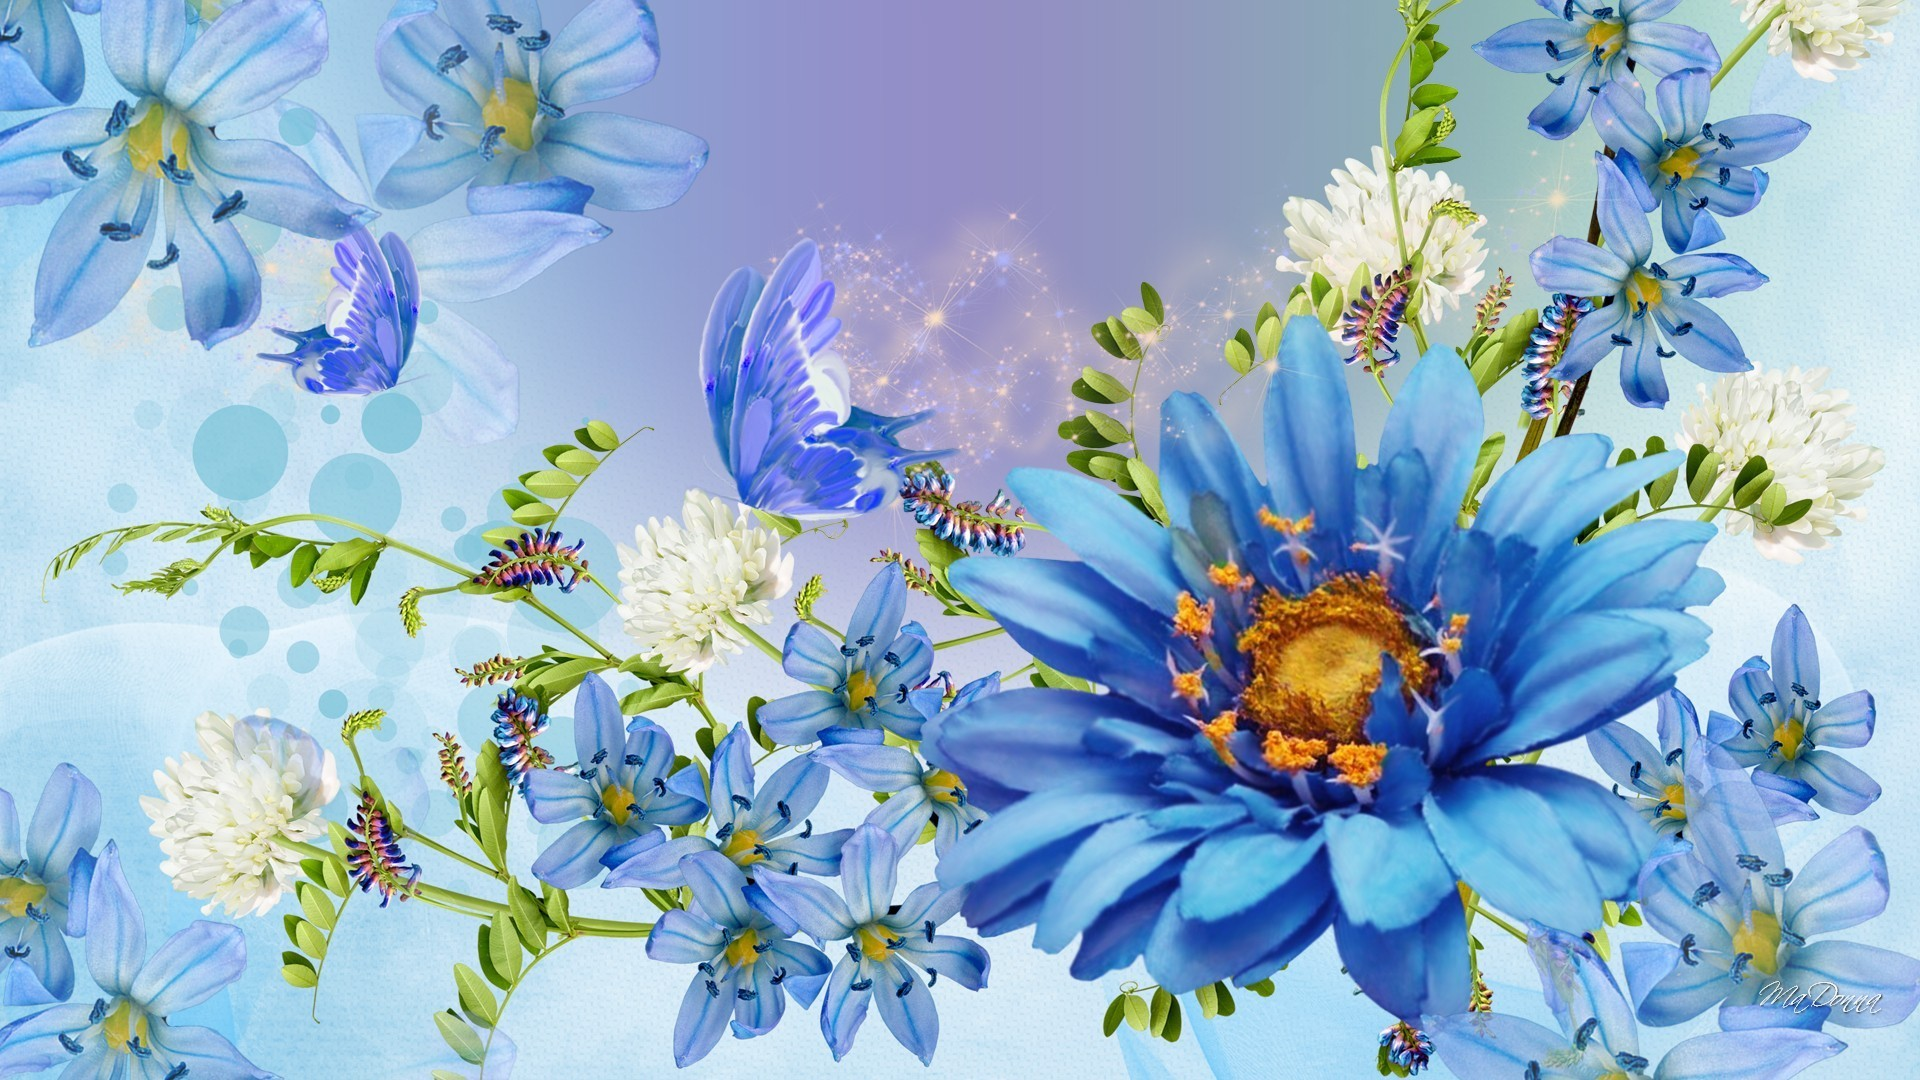 Beautiful Spring Blue Blossoms Bright Clover Blues Papillon Butterfly  Fleurs Lavender Blooms Flowers Summer Flower Wallpapers